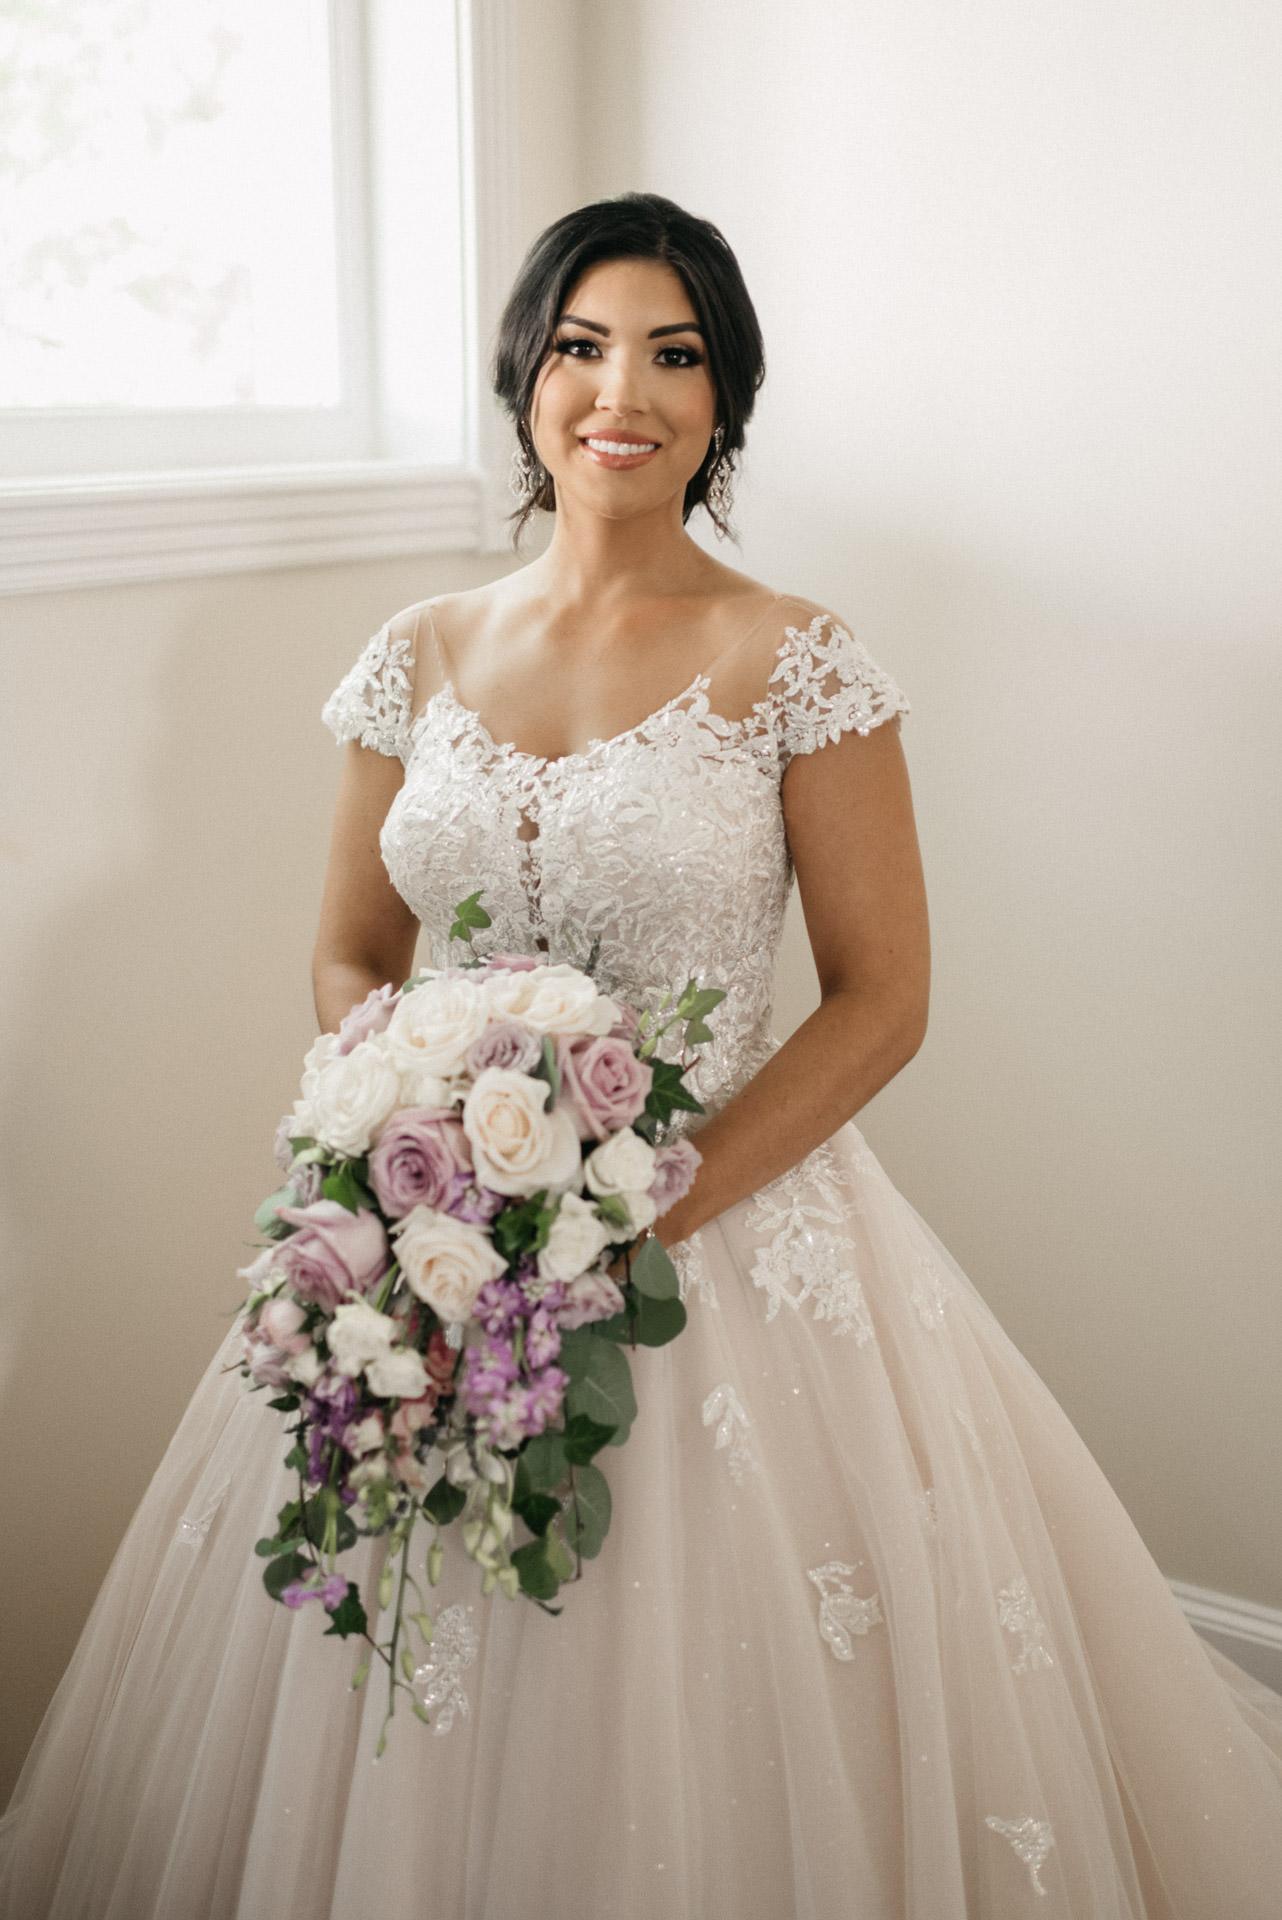 lexi-michael-wedding-blog-sm-29.jpg